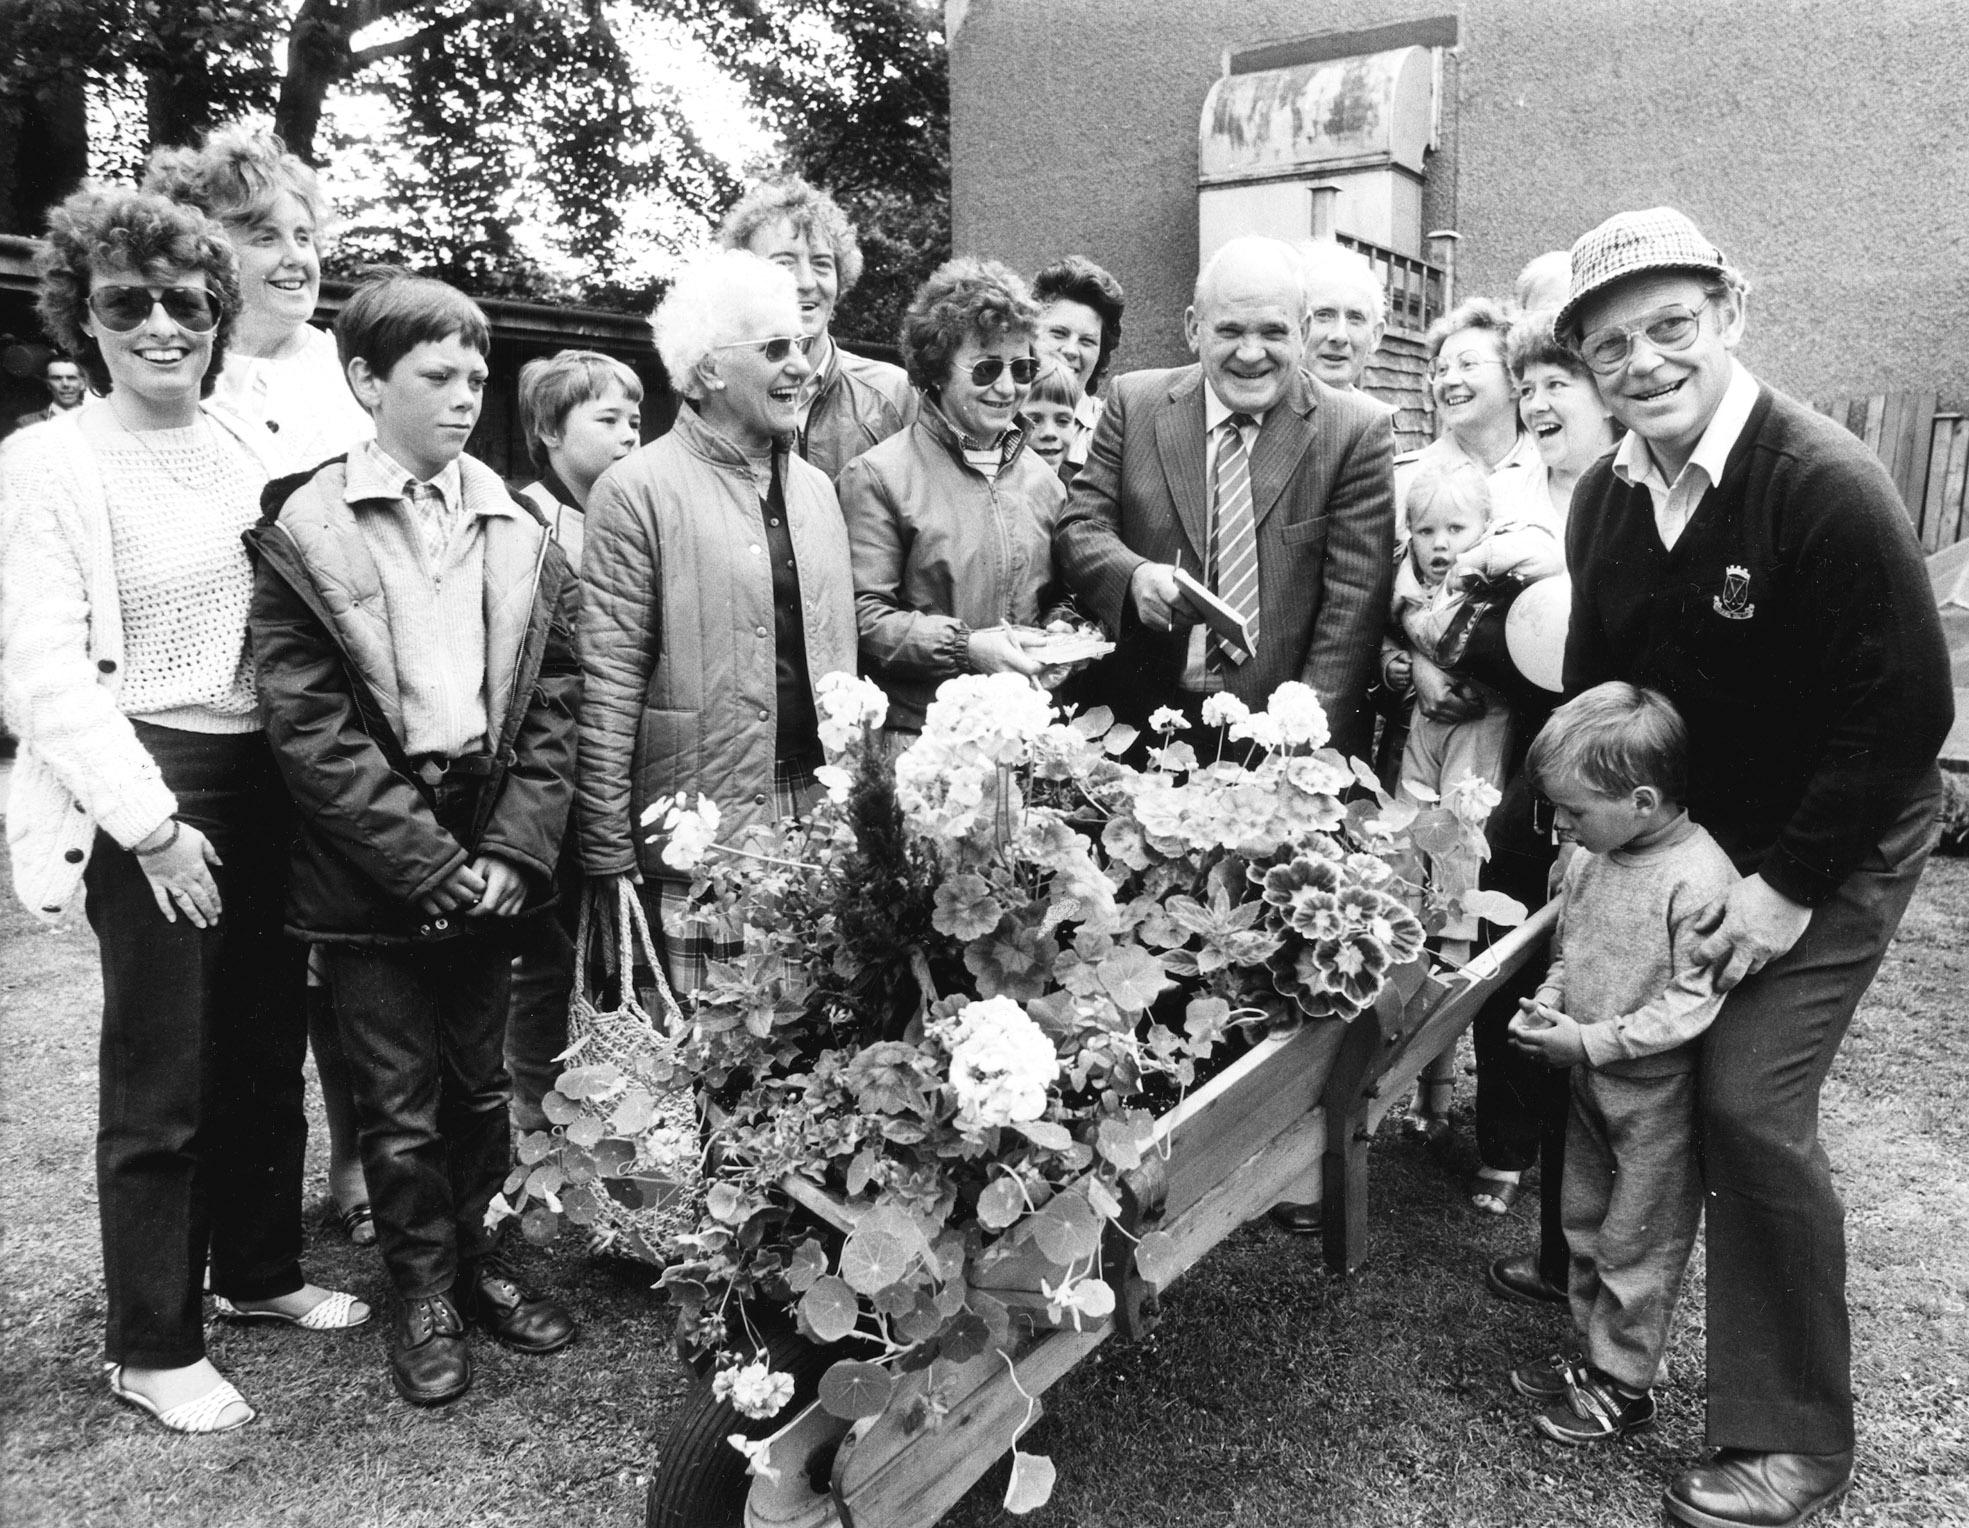 Scottish gardening legend Jim McColl says goodbye to Beechgrove